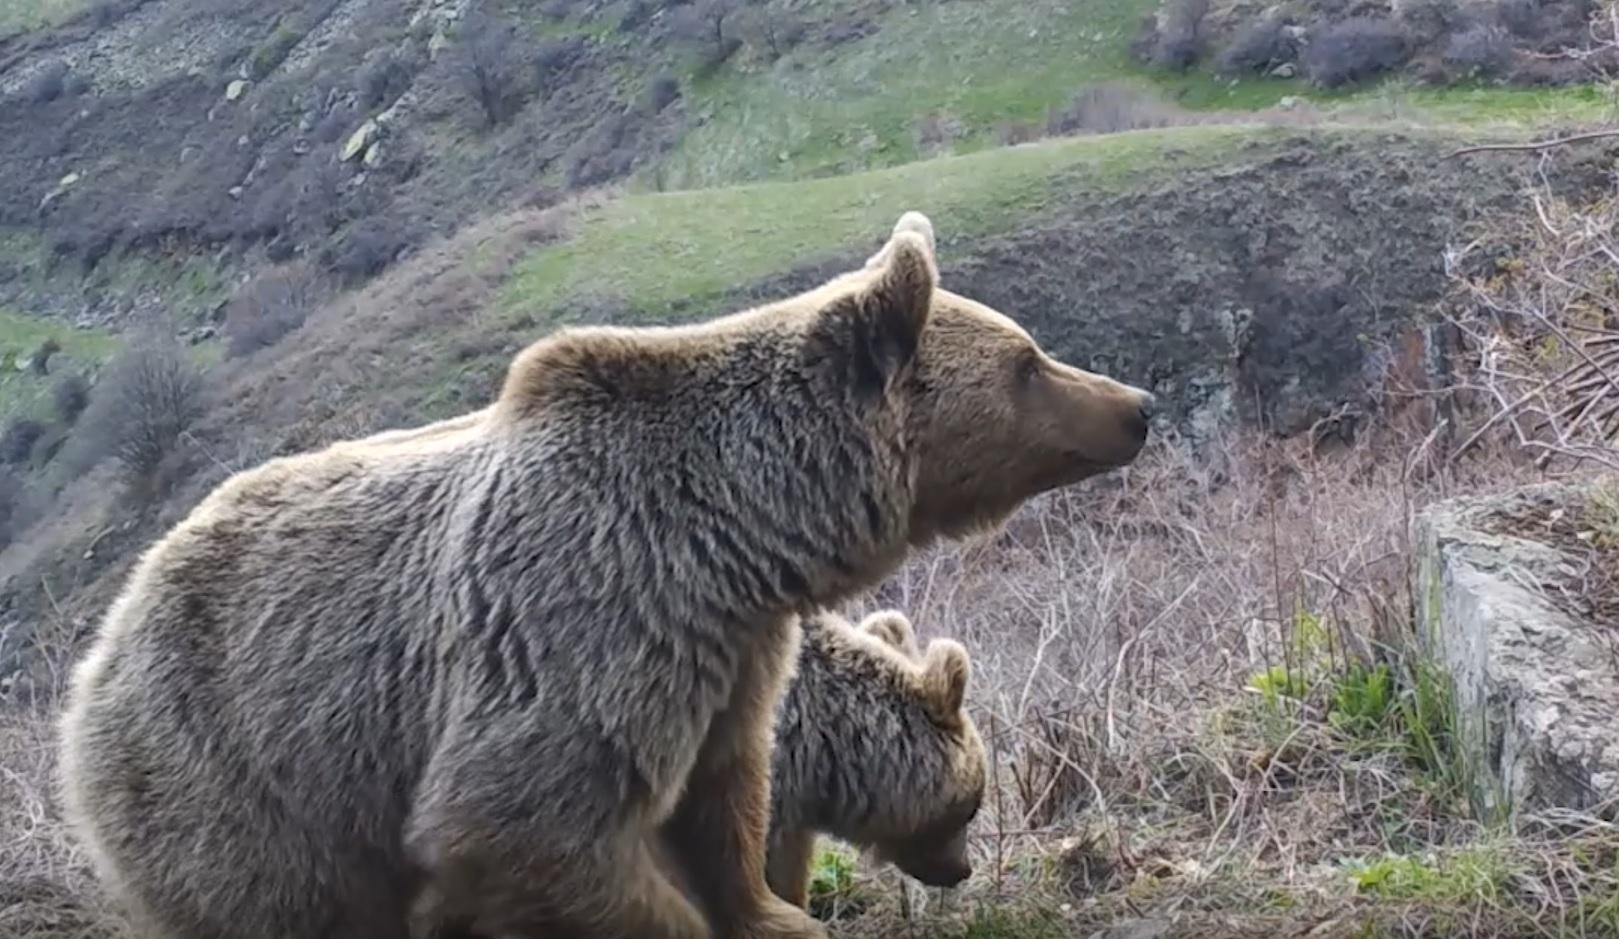 Photo of Ինչպես են մայր արջն ու քոթոթները վայելում իրենց ազատությունն ու անկաշկանդ առօրյան վայրի բնության մեջ